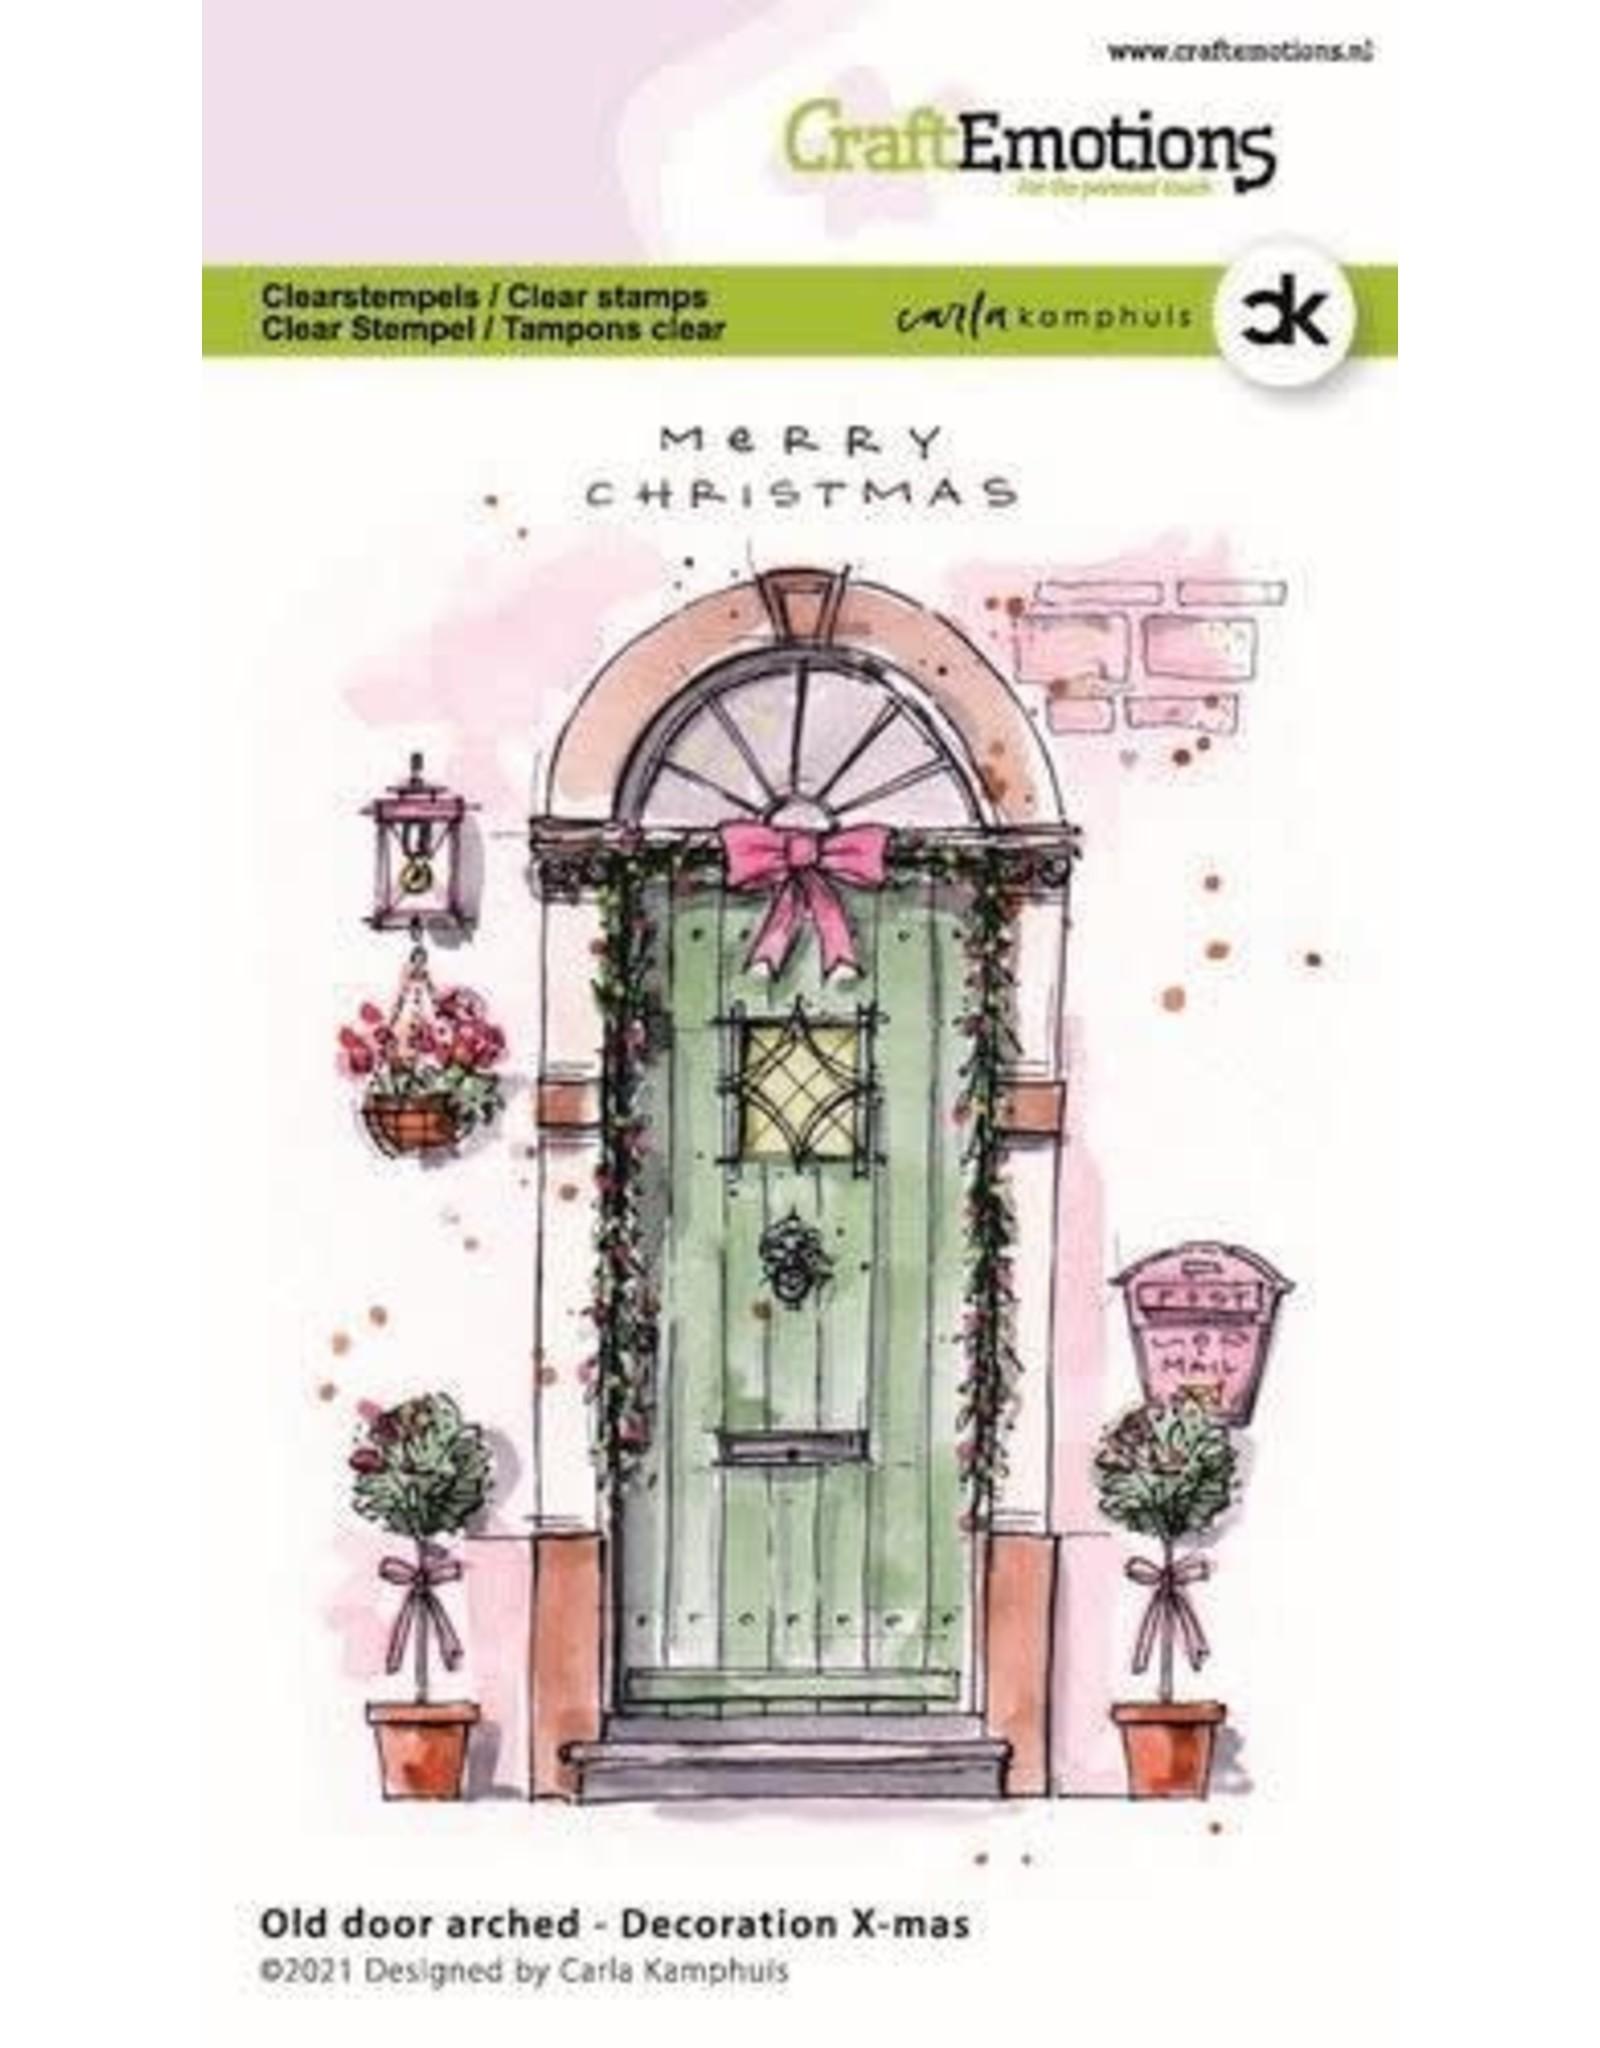 Craft Emotions CraftEmotions clearstamps A6 - Oude deur met toog - Decoration X-mas Carla Kamphuis